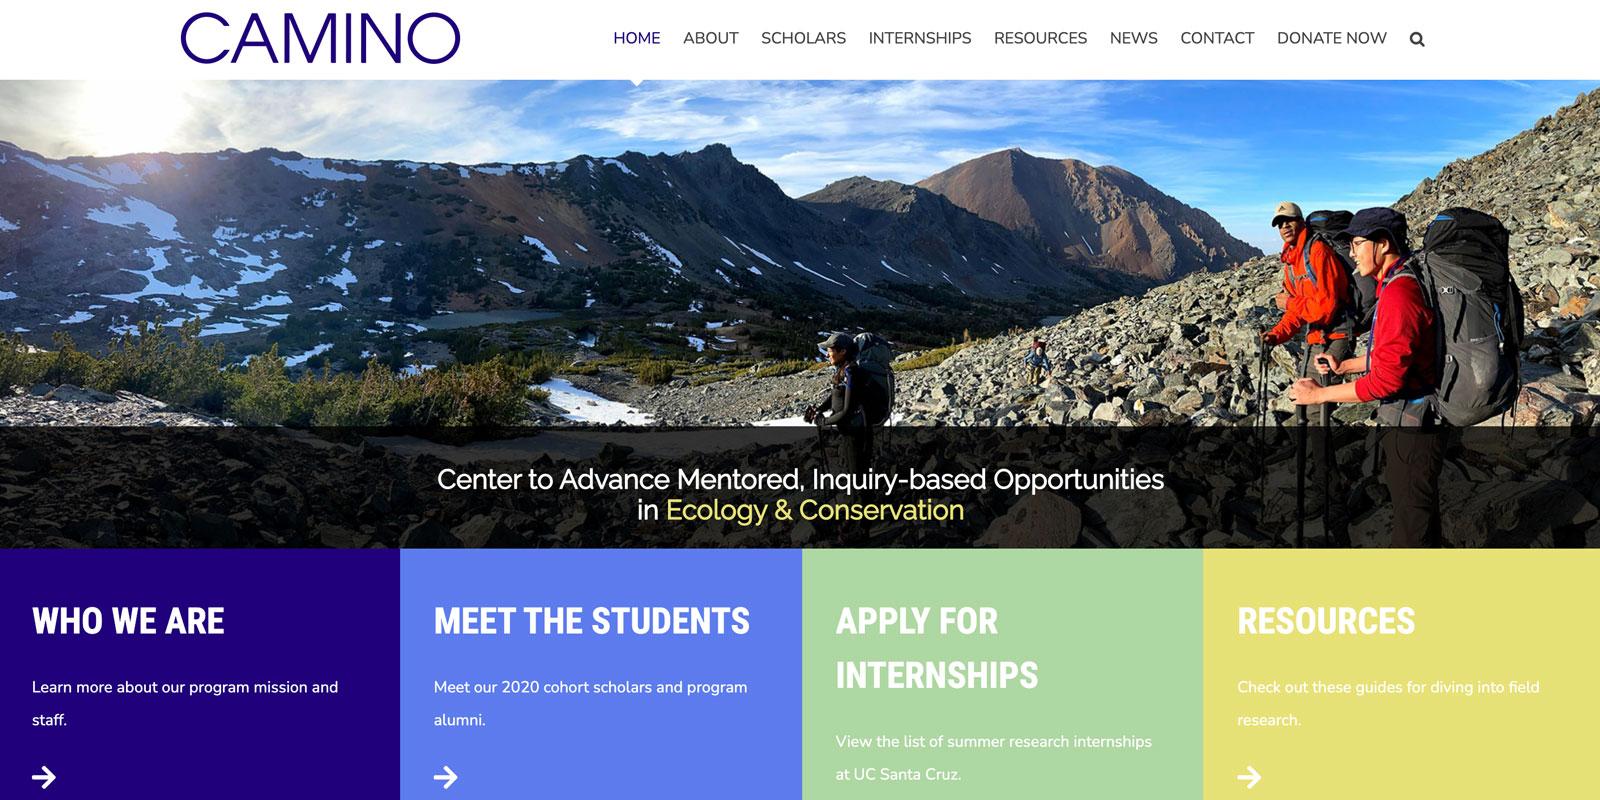 CAMINO website for UCSC